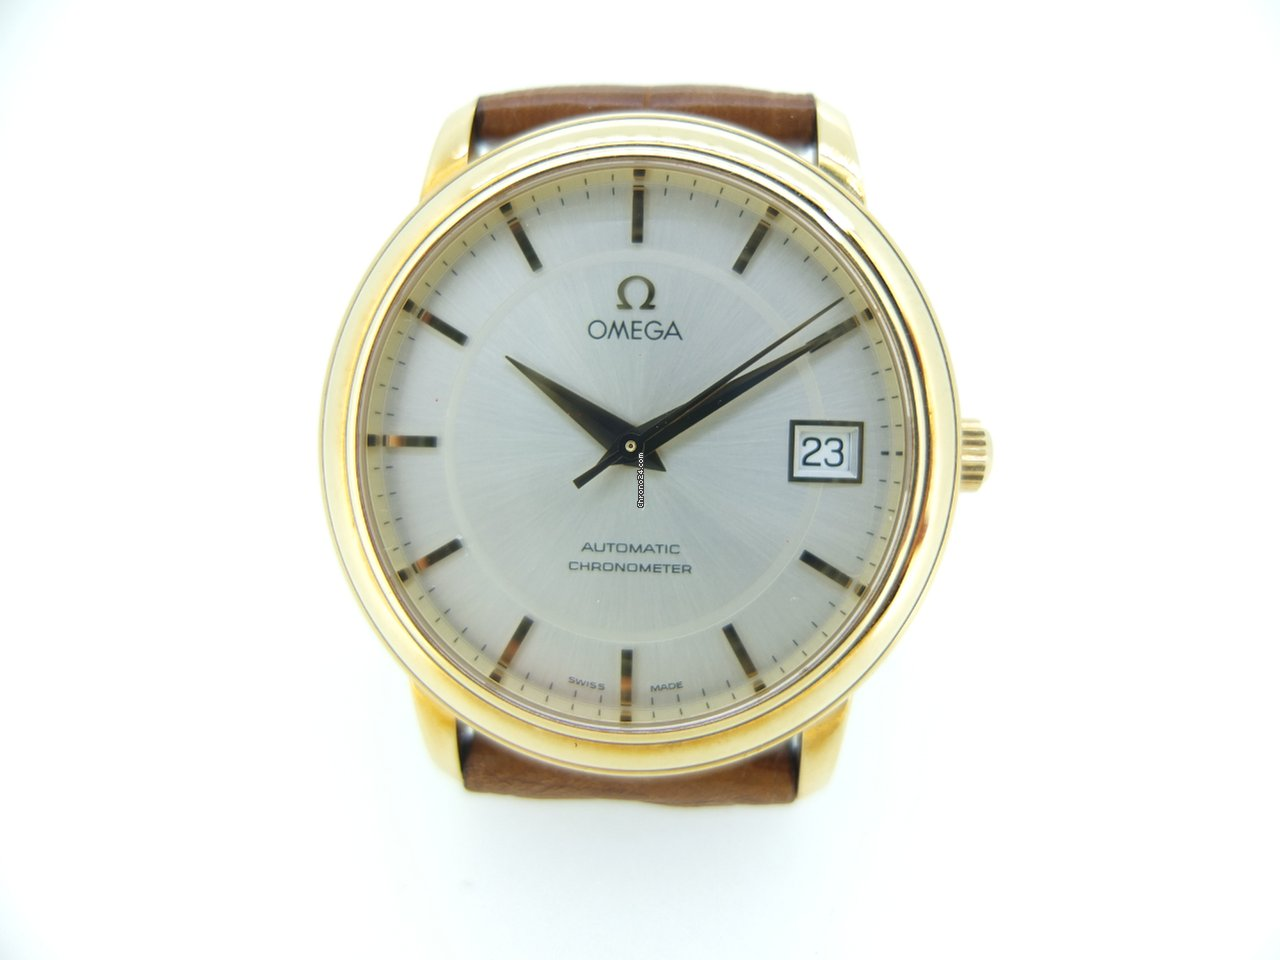 bec50b3f83d0 Relojes Omega - Precios de todos los relojes Omega en Chrono24